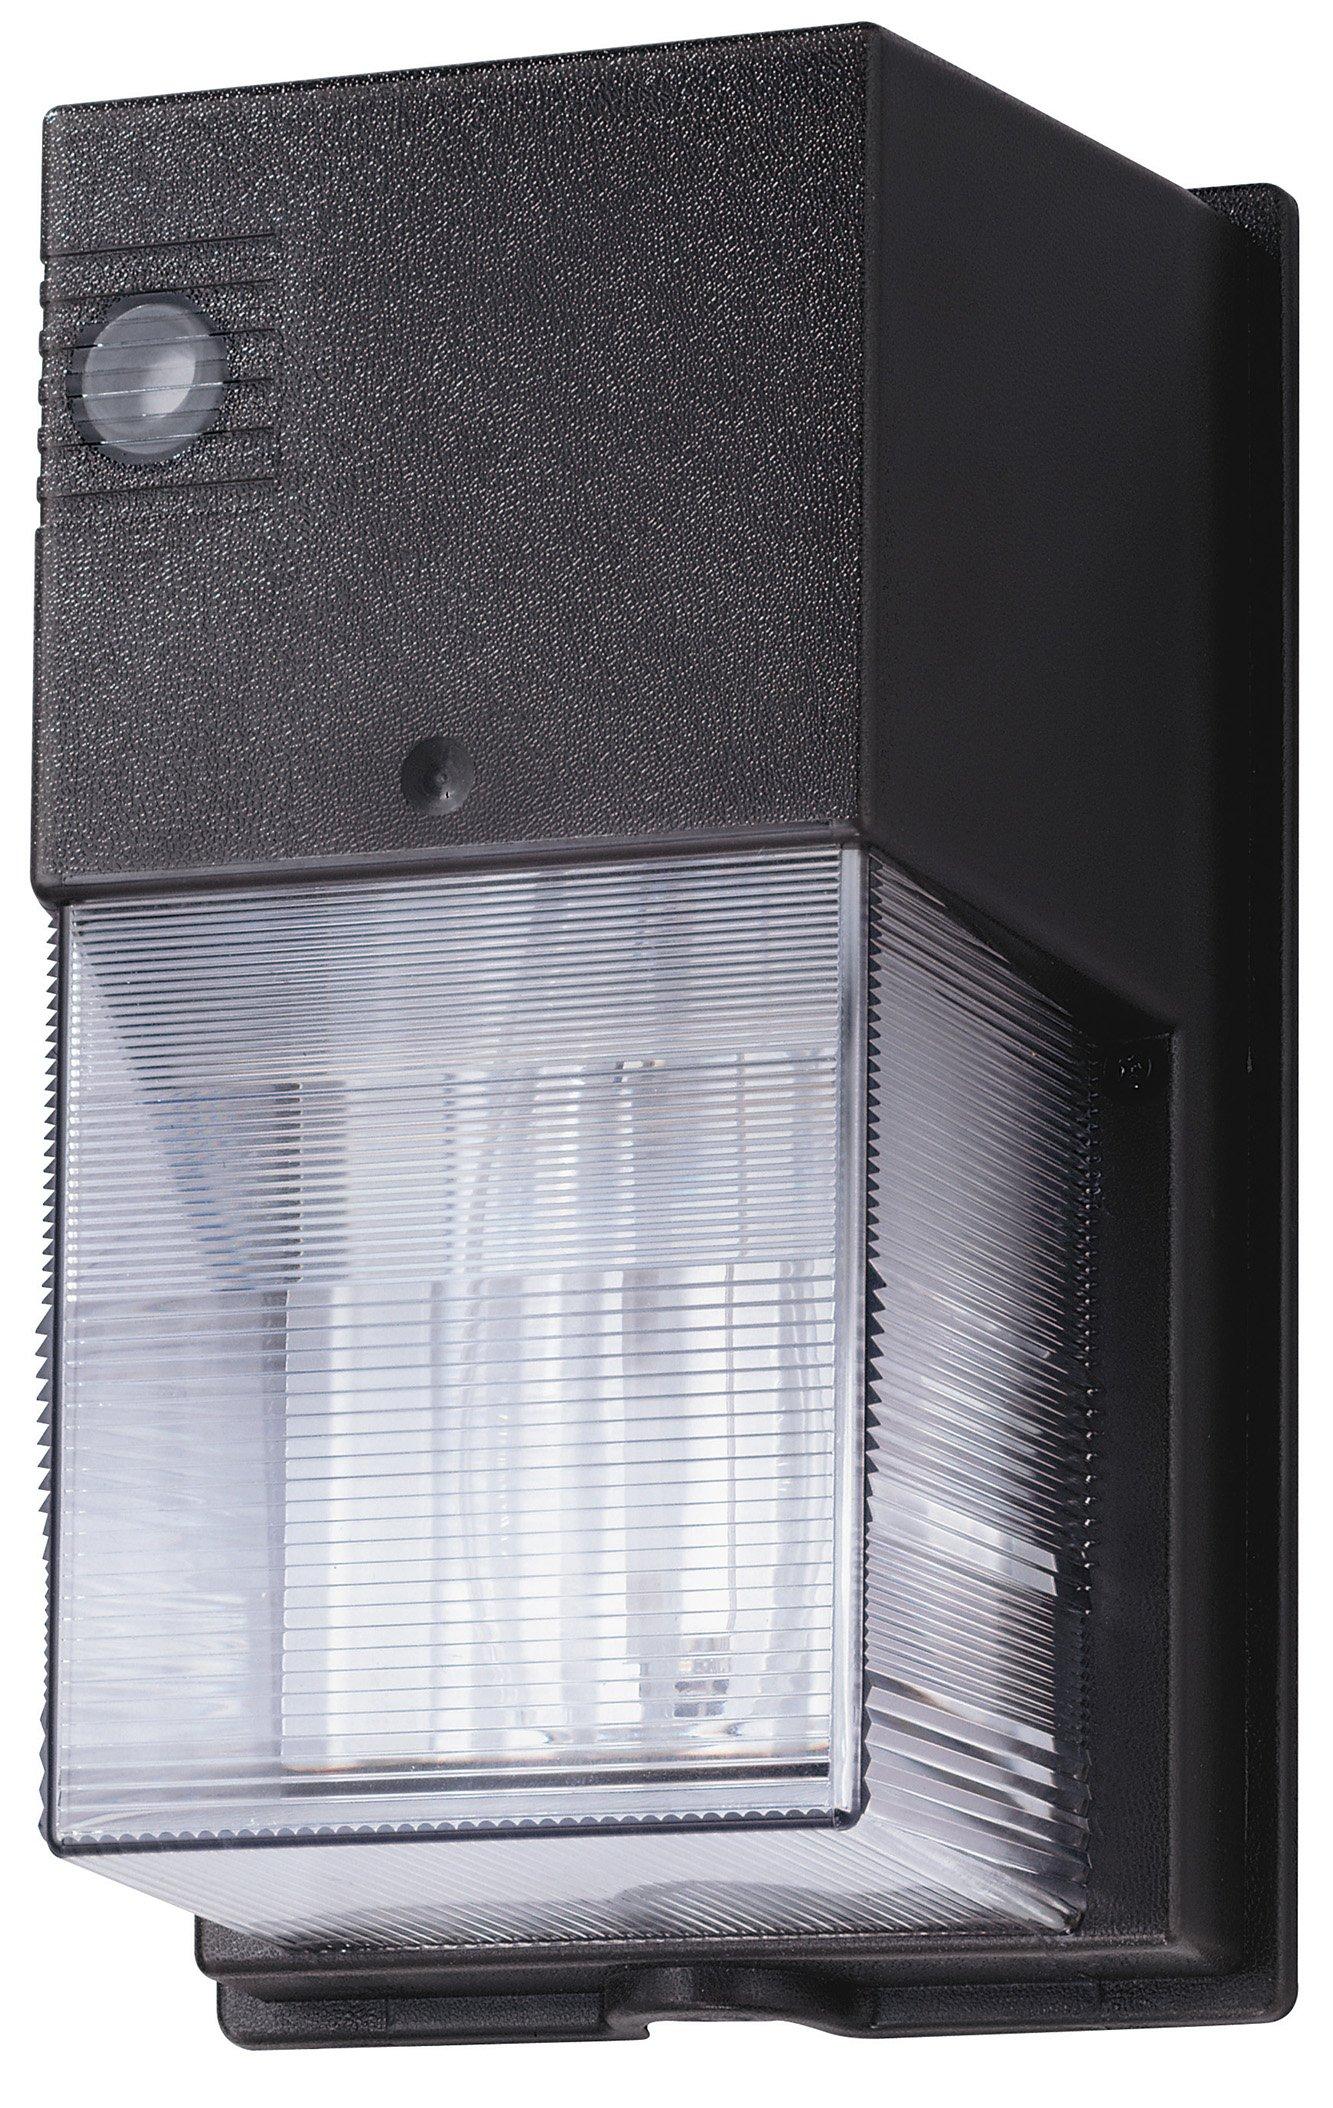 Lithonia Lighting TWS 50M 120 PE LPI M6 50-watt Metal Halide Wallpack with Photocell and Lamp, Bronze